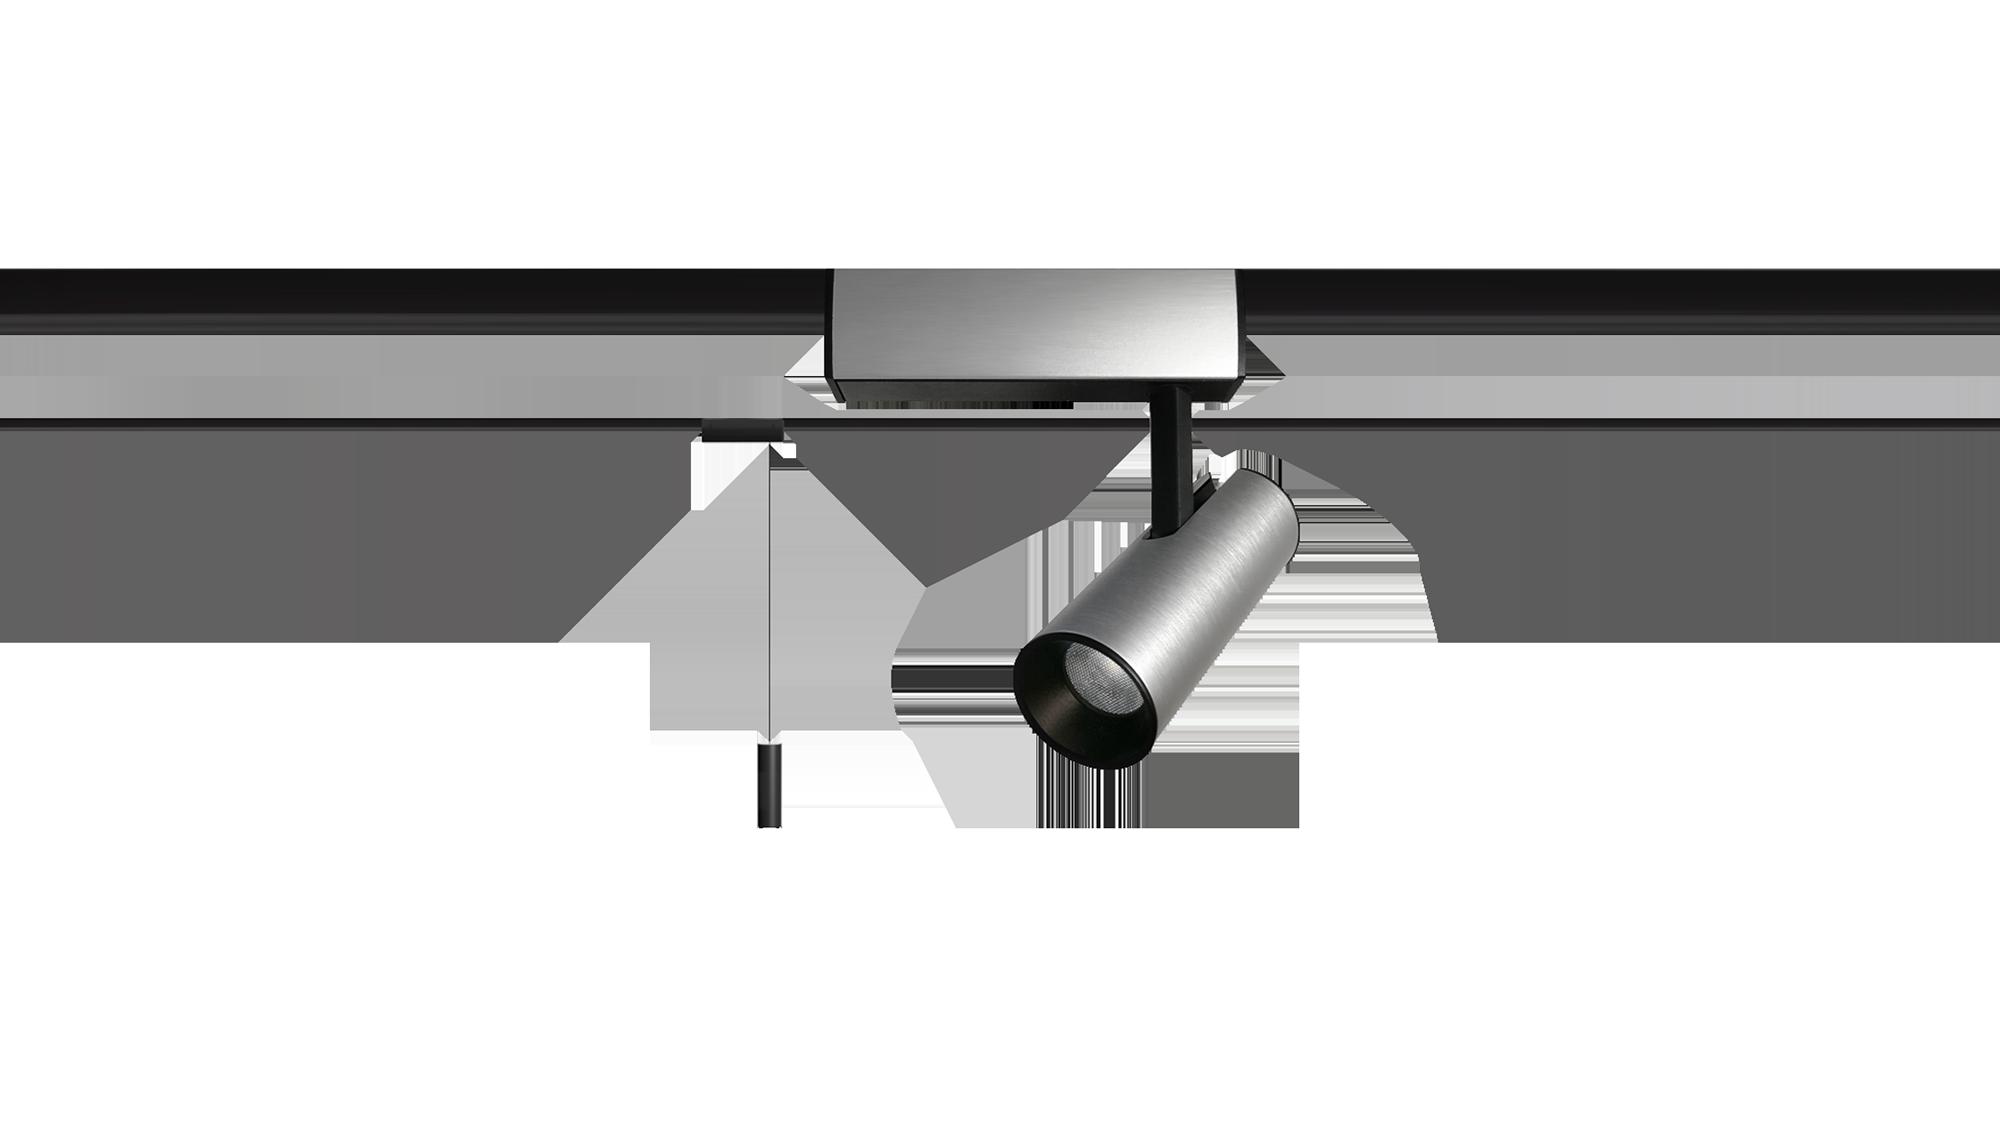 Linea Light Illuminazione.Systems Ink Indoor Linea Light Group